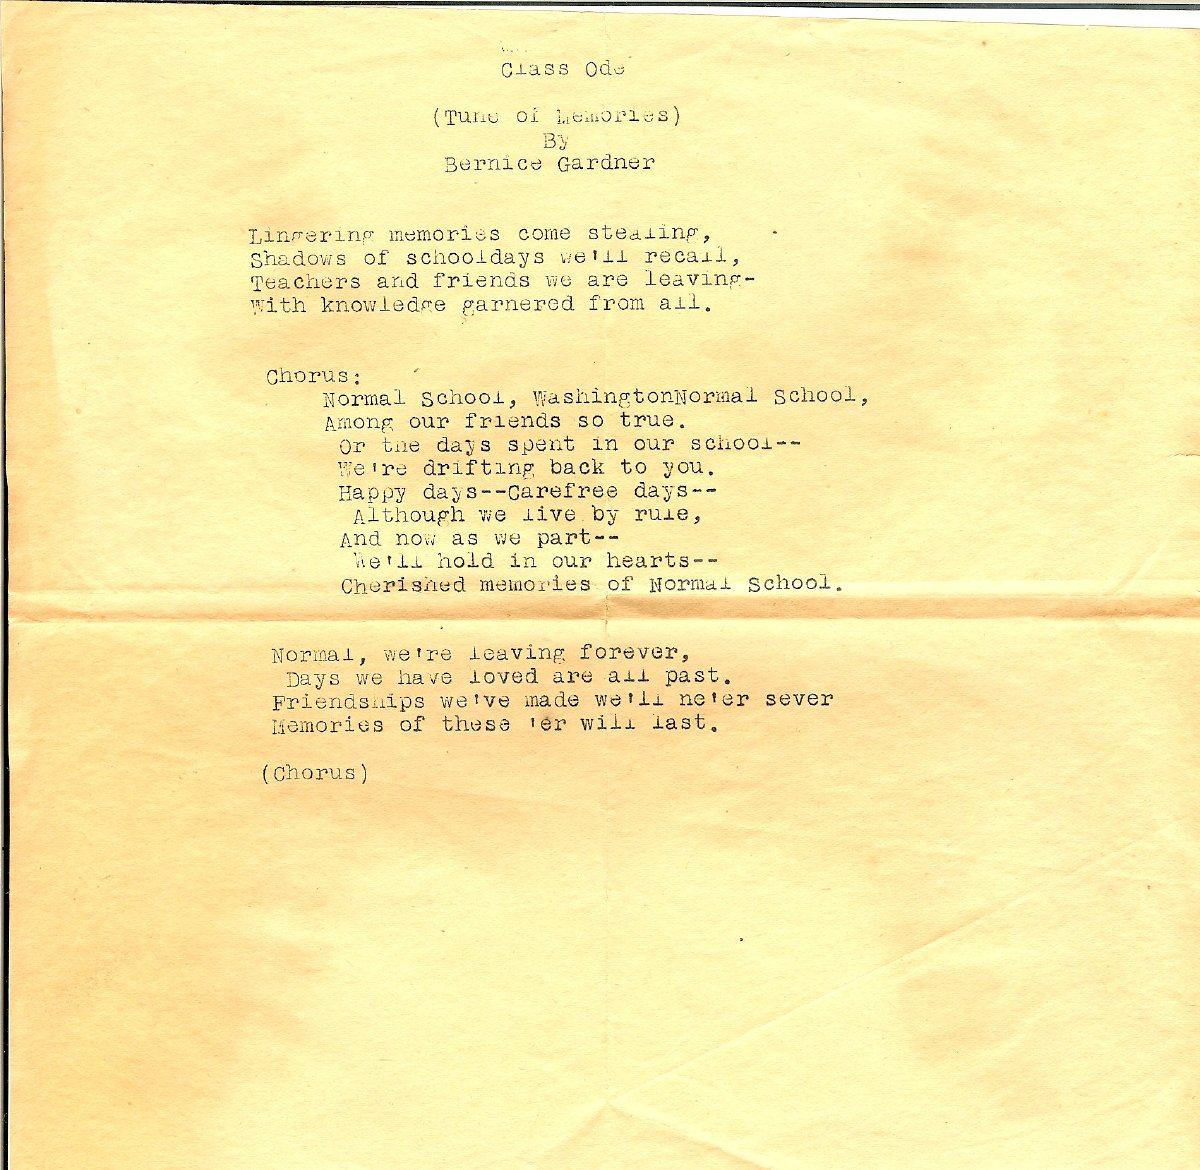 Washington State Normal School Commencement Class Ode written by Bernice Gardner